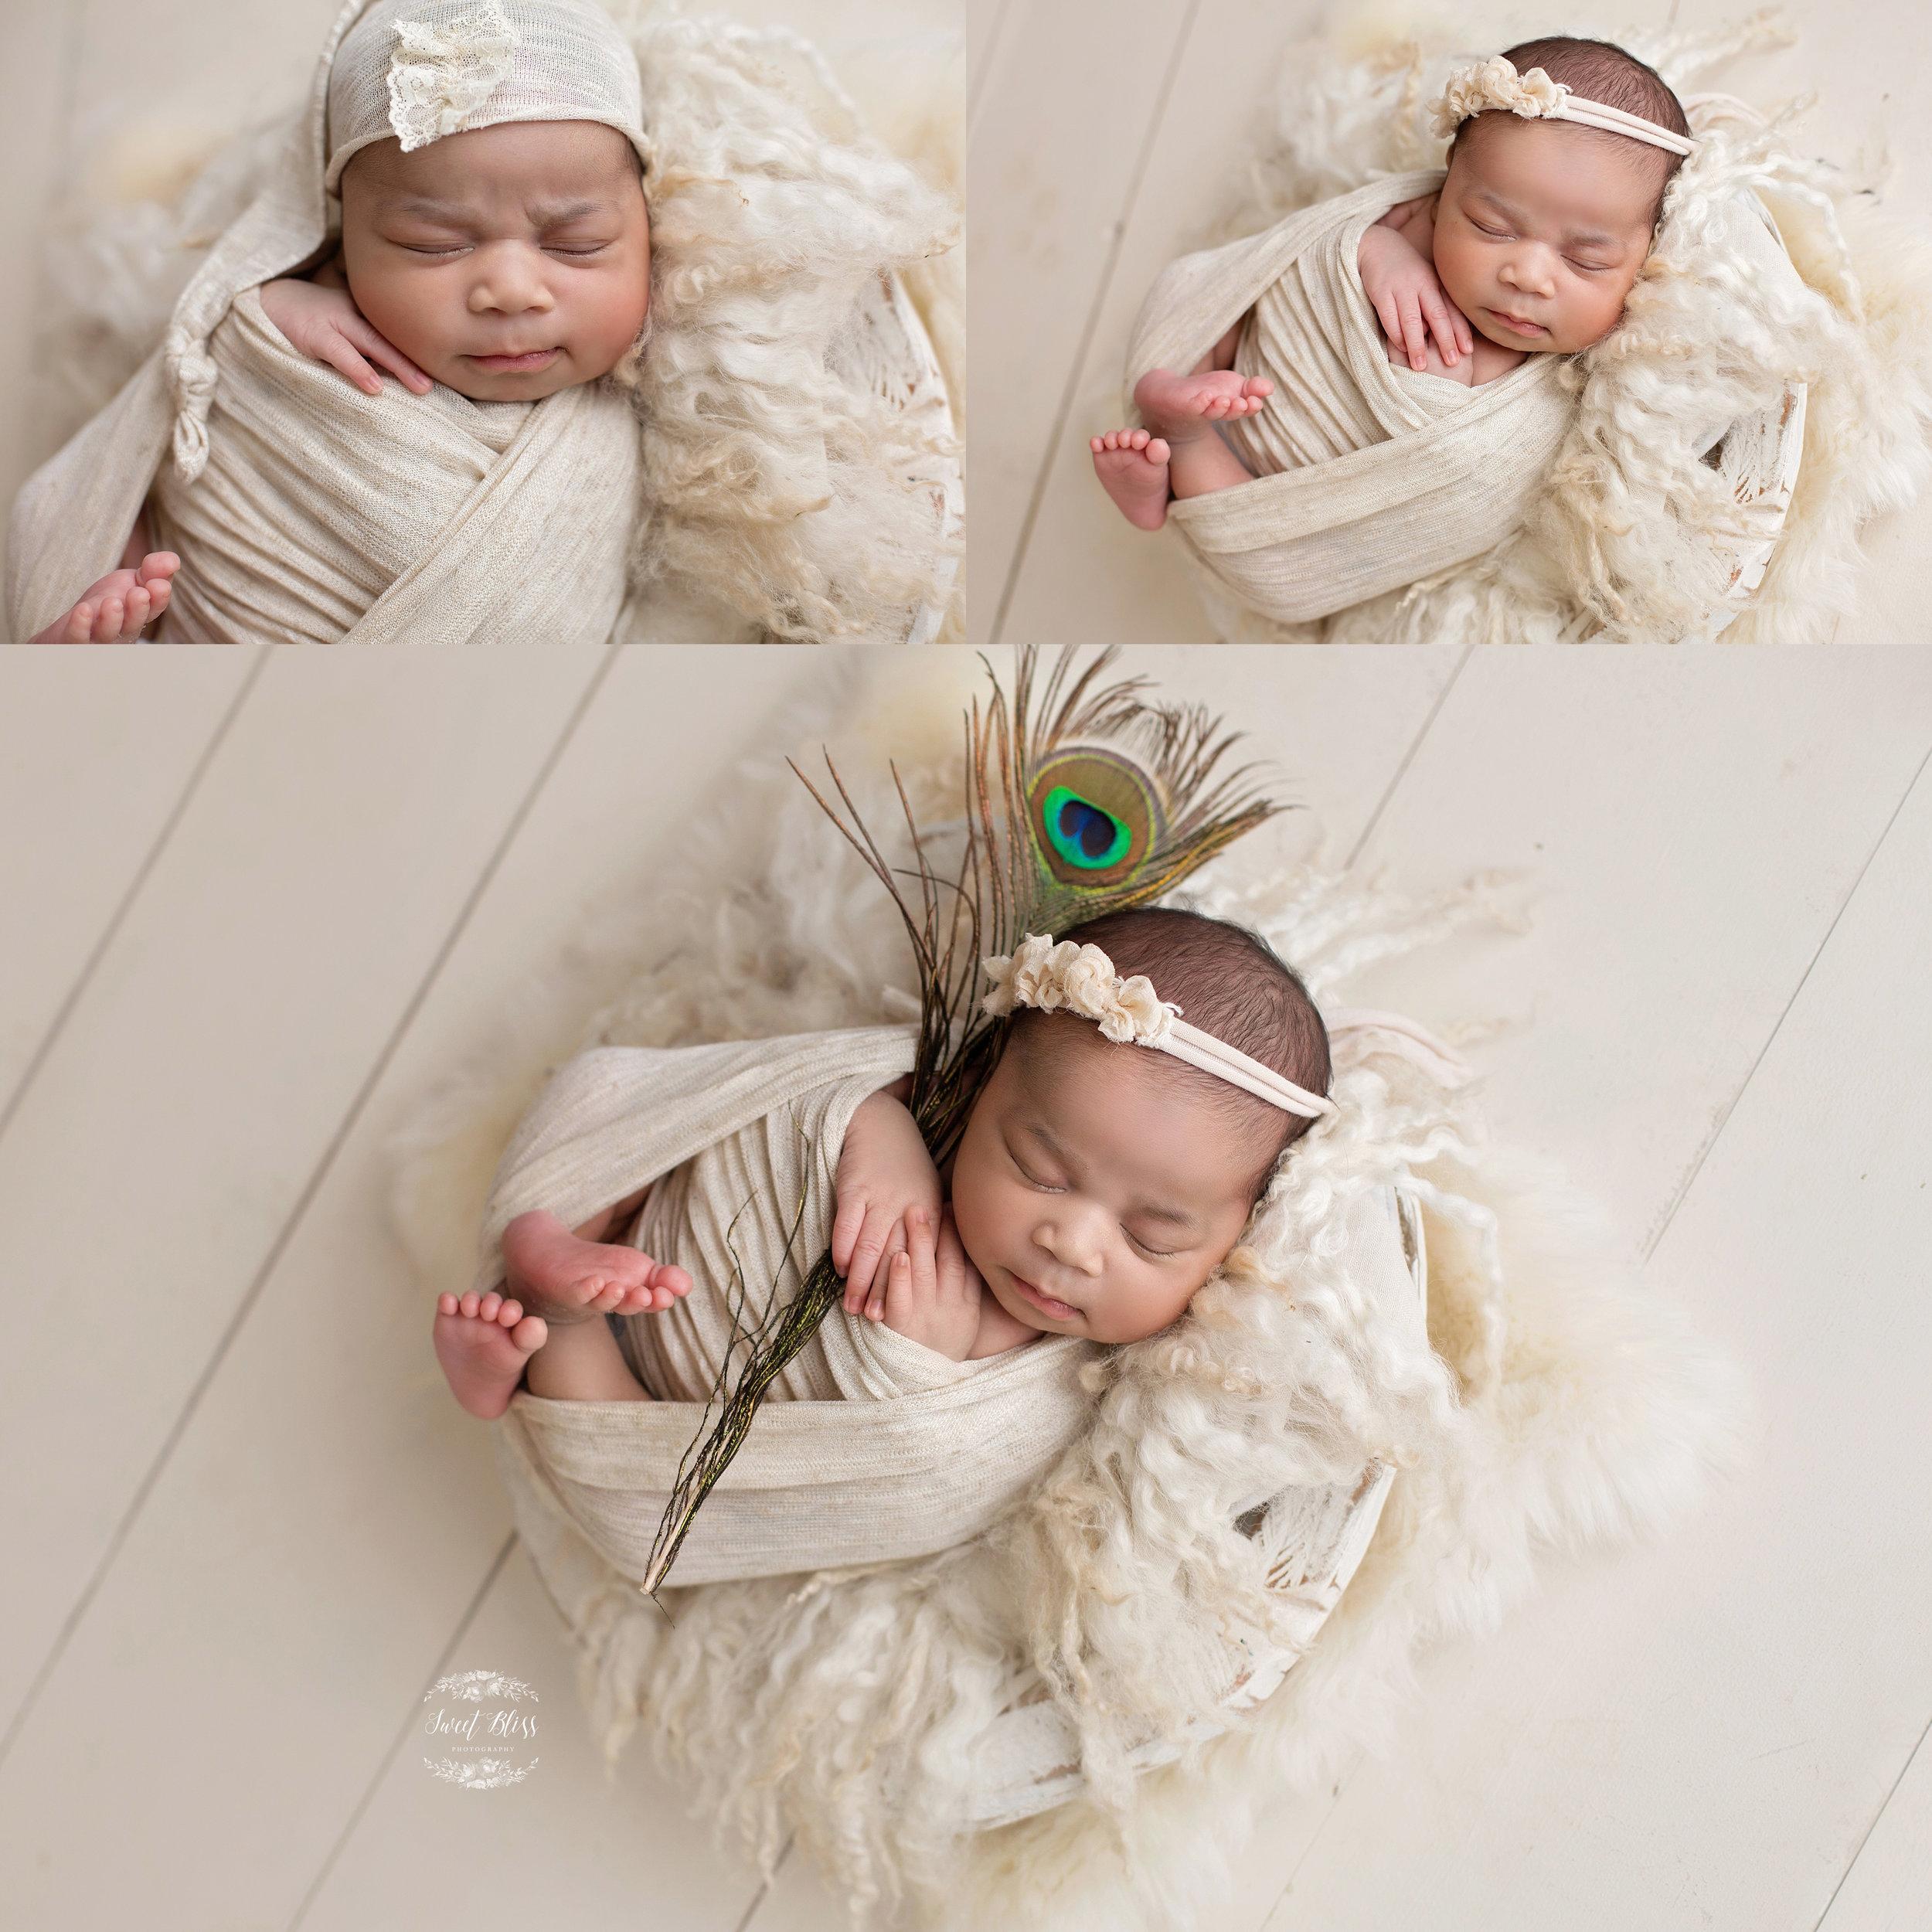 Sweetblissphotography_newbornbaltimore_cream1.jpg